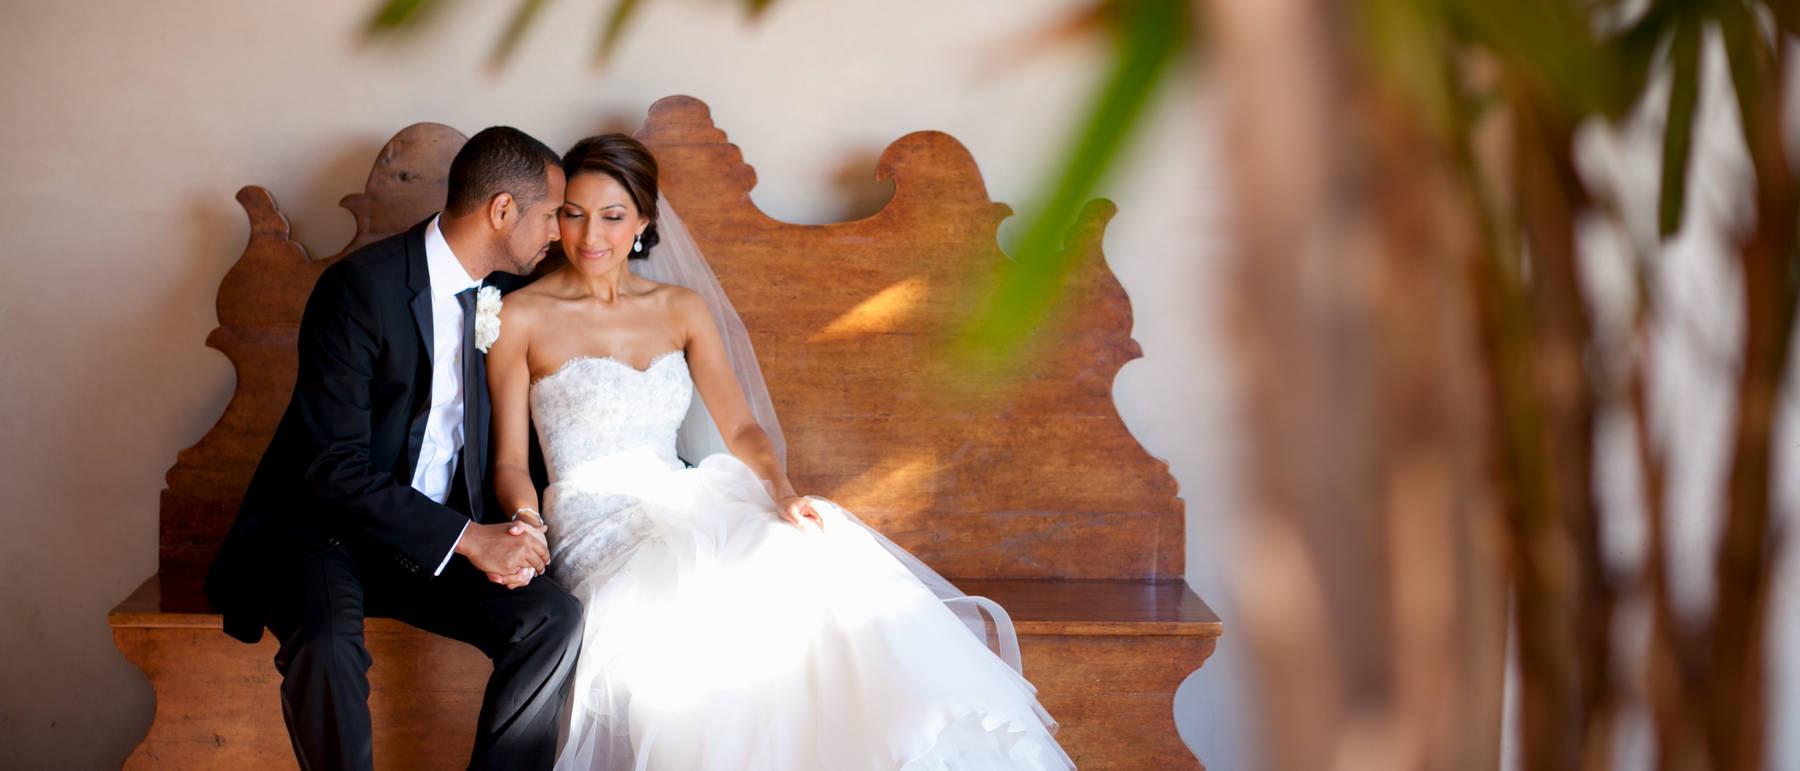 johnandjoseph-wedding-photographer-hz-slider-205